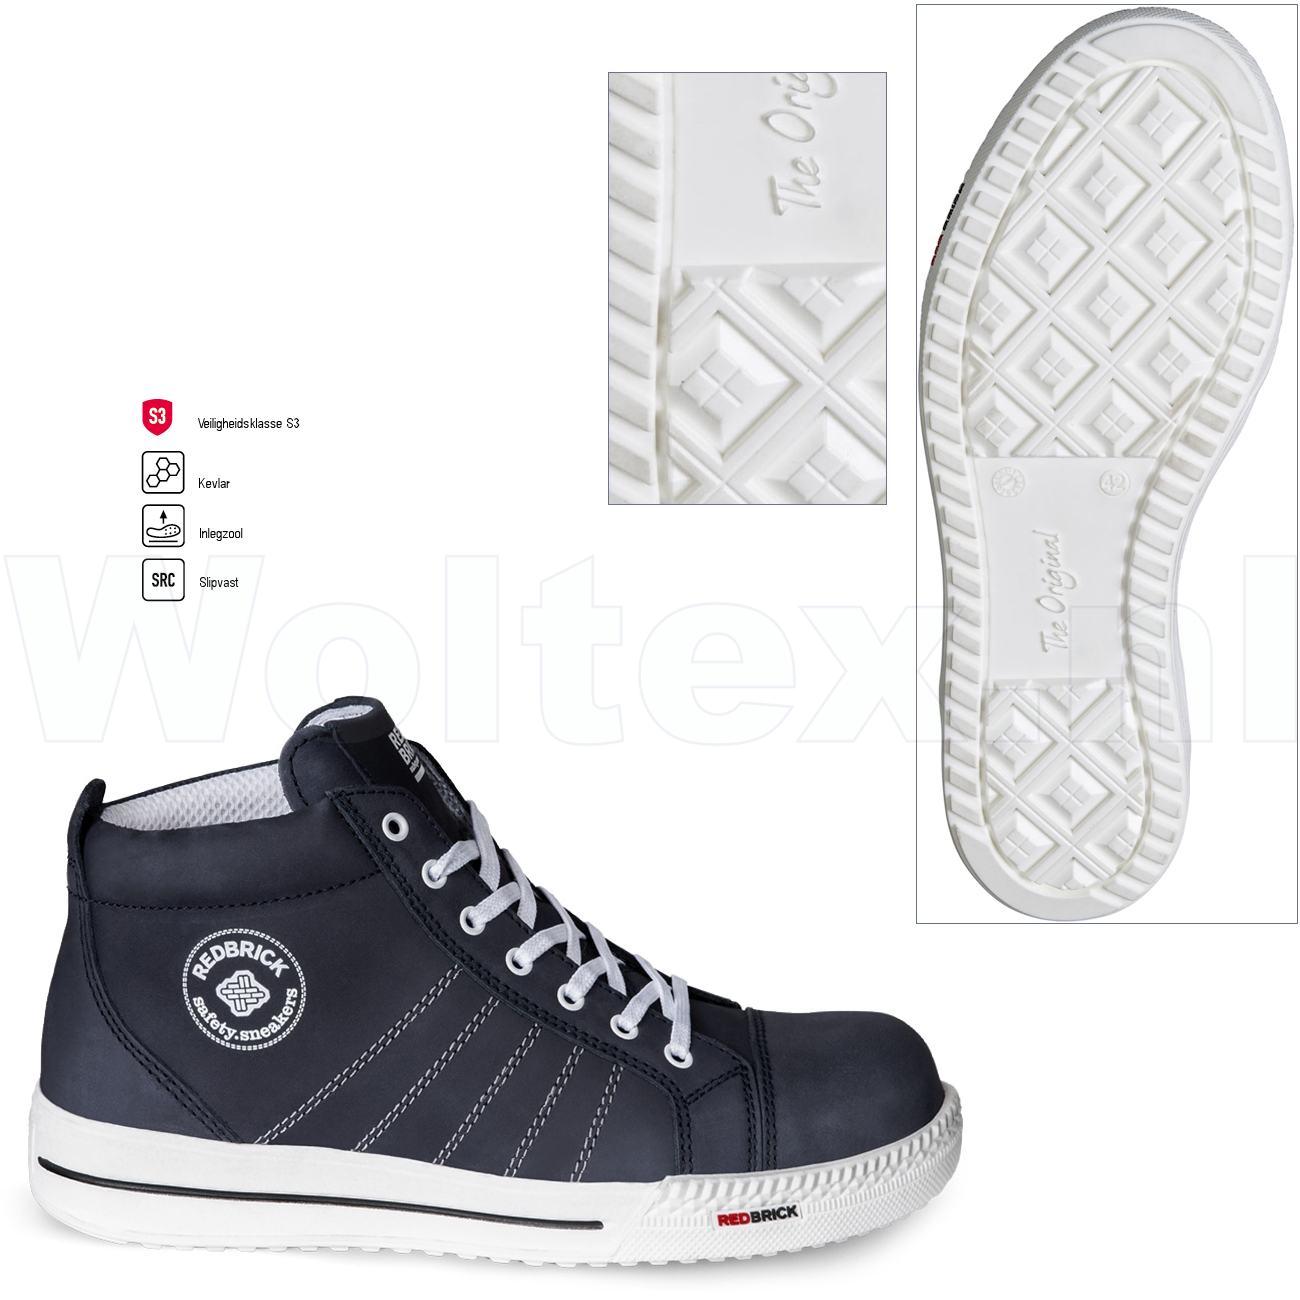 Witte Werkschoenen.Redbrick Safety Sneakers Originals S3 Werkschoenen Azure Donkerblauw 42